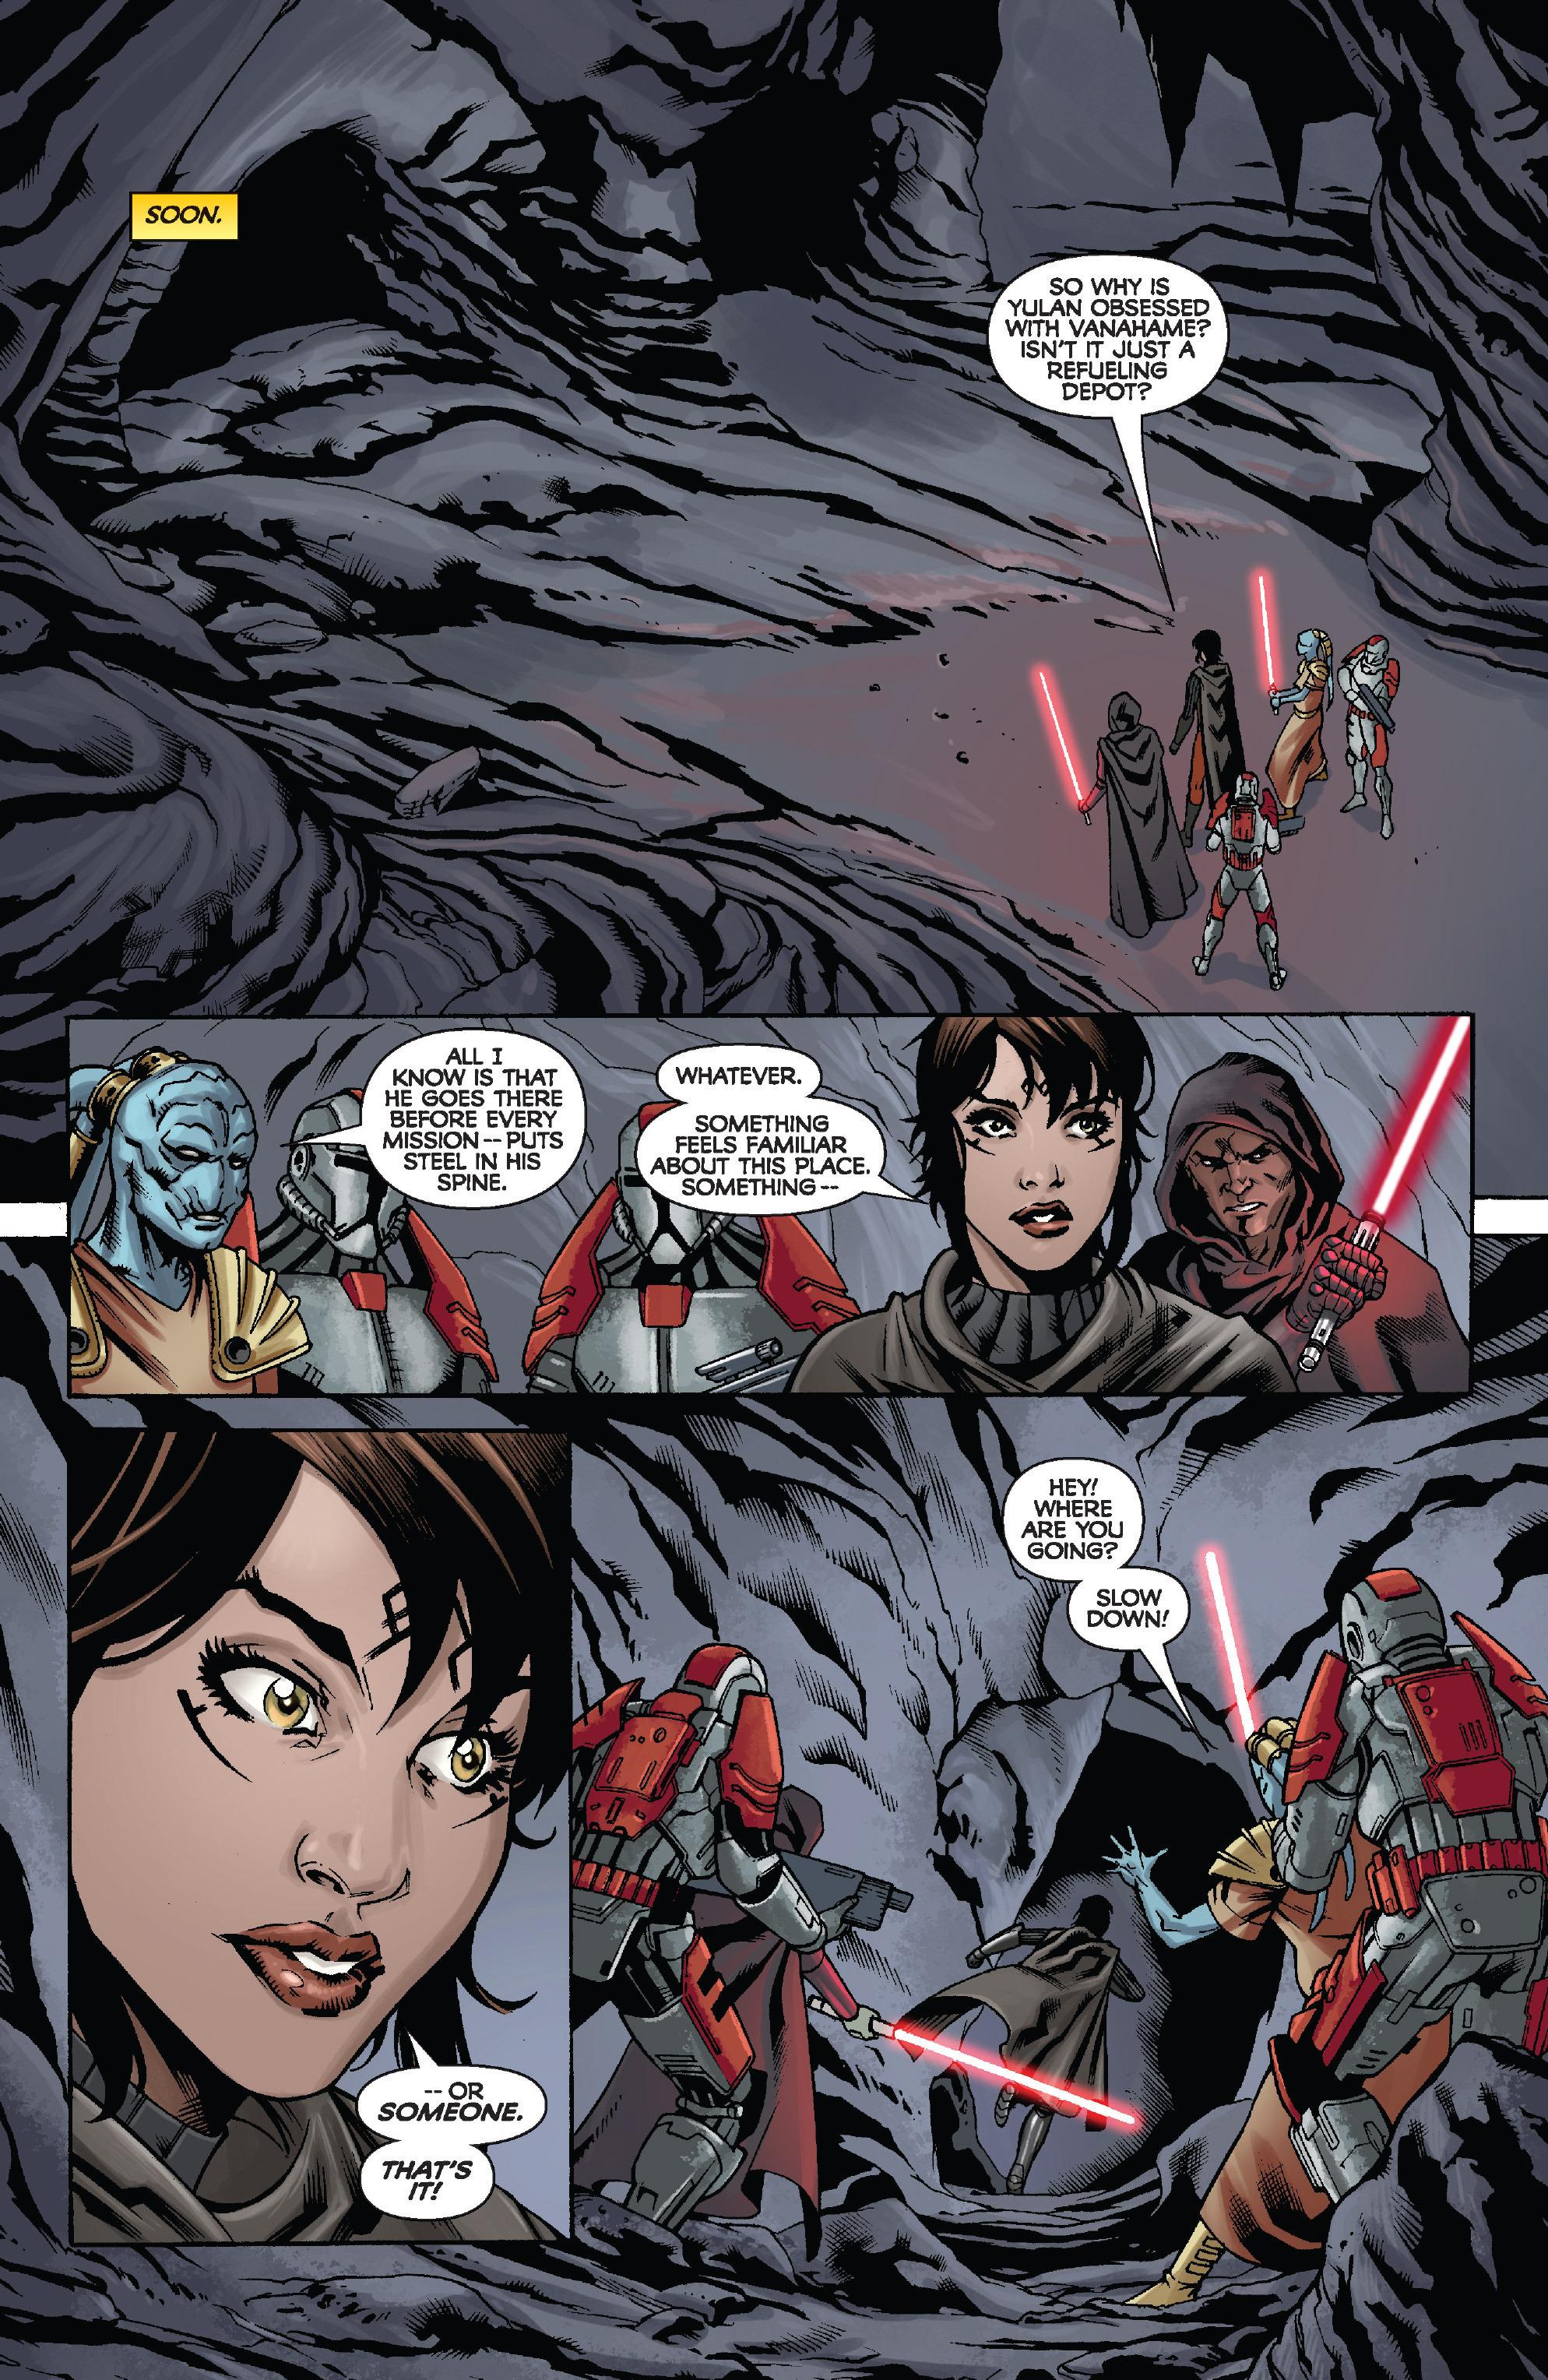 Read online Star Wars: Knight Errant - Escape comic -  Issue #2 - 10